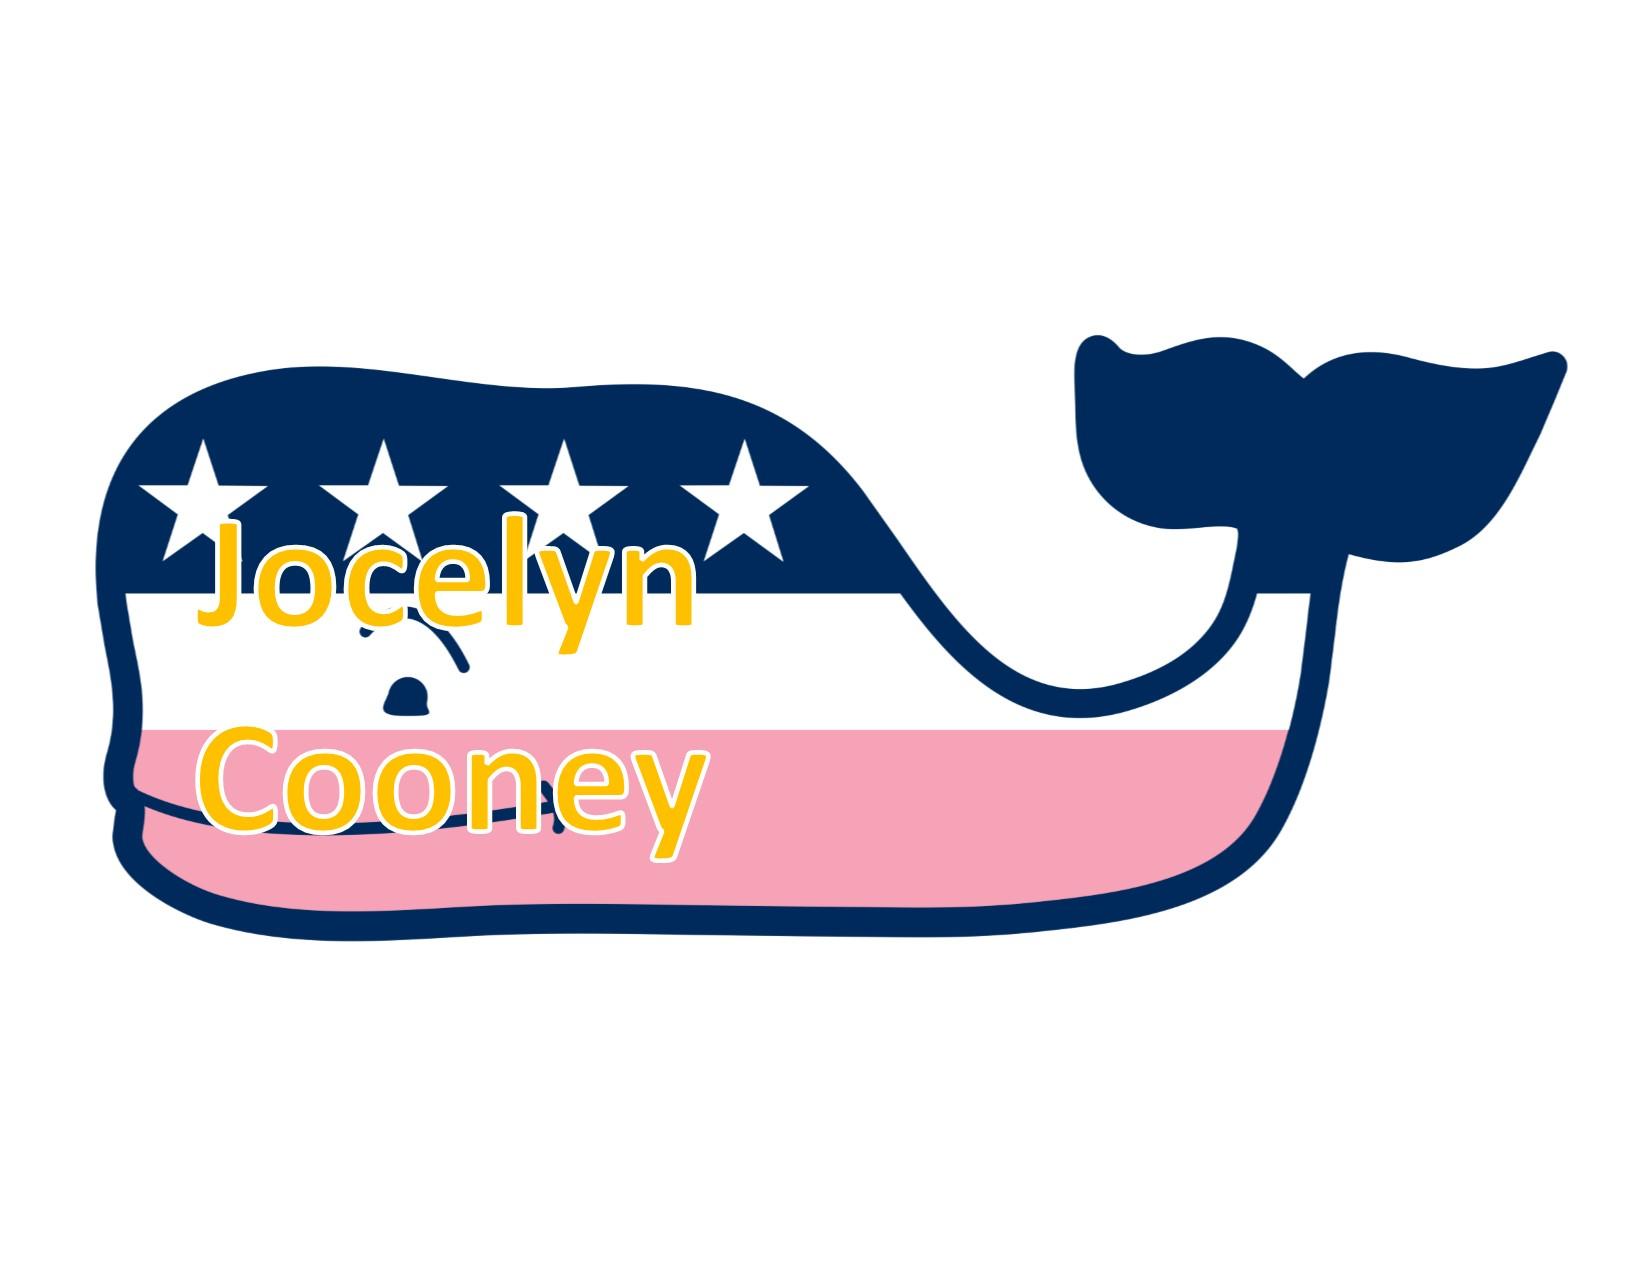 Cooney, Jocelyn.jpg